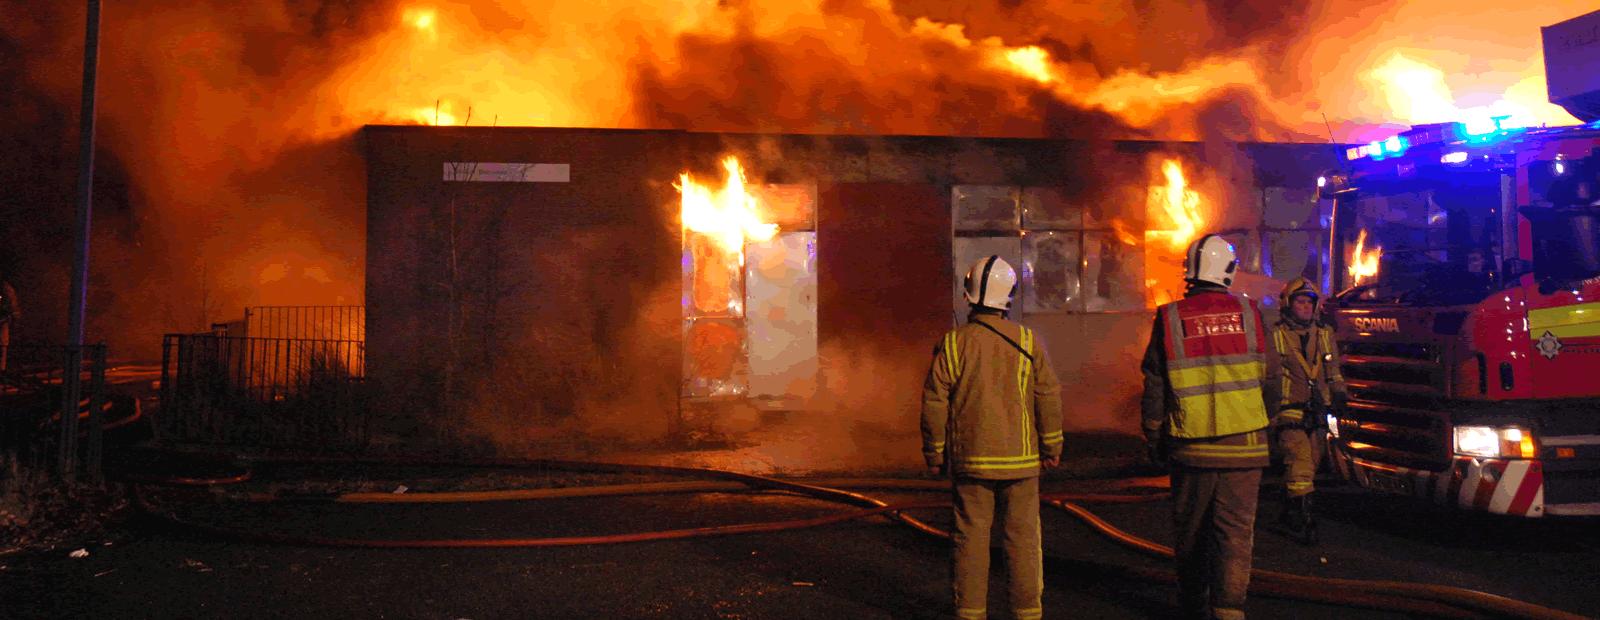 Lawton Fire slider